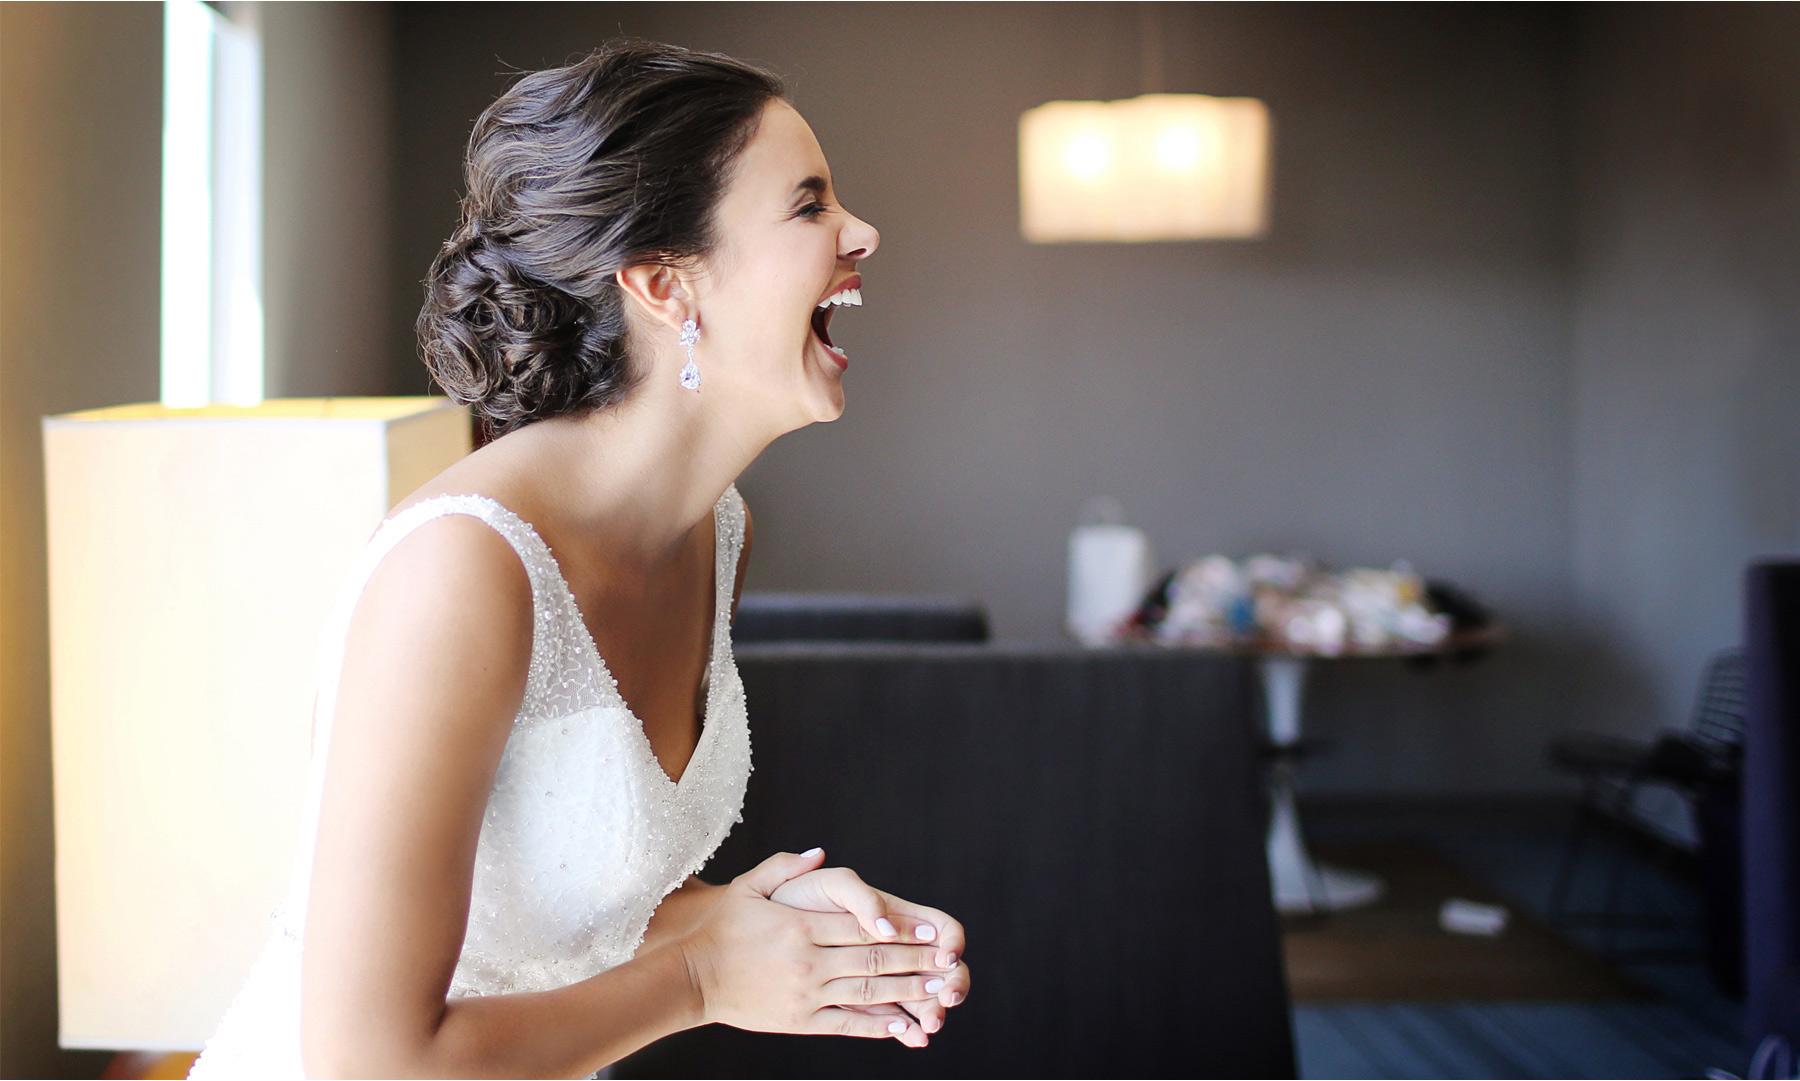 02-Minneapolis-Minnesota-Wedding-Photography-by-Vick-Photography-Bride-Lalu-&-John.jpg